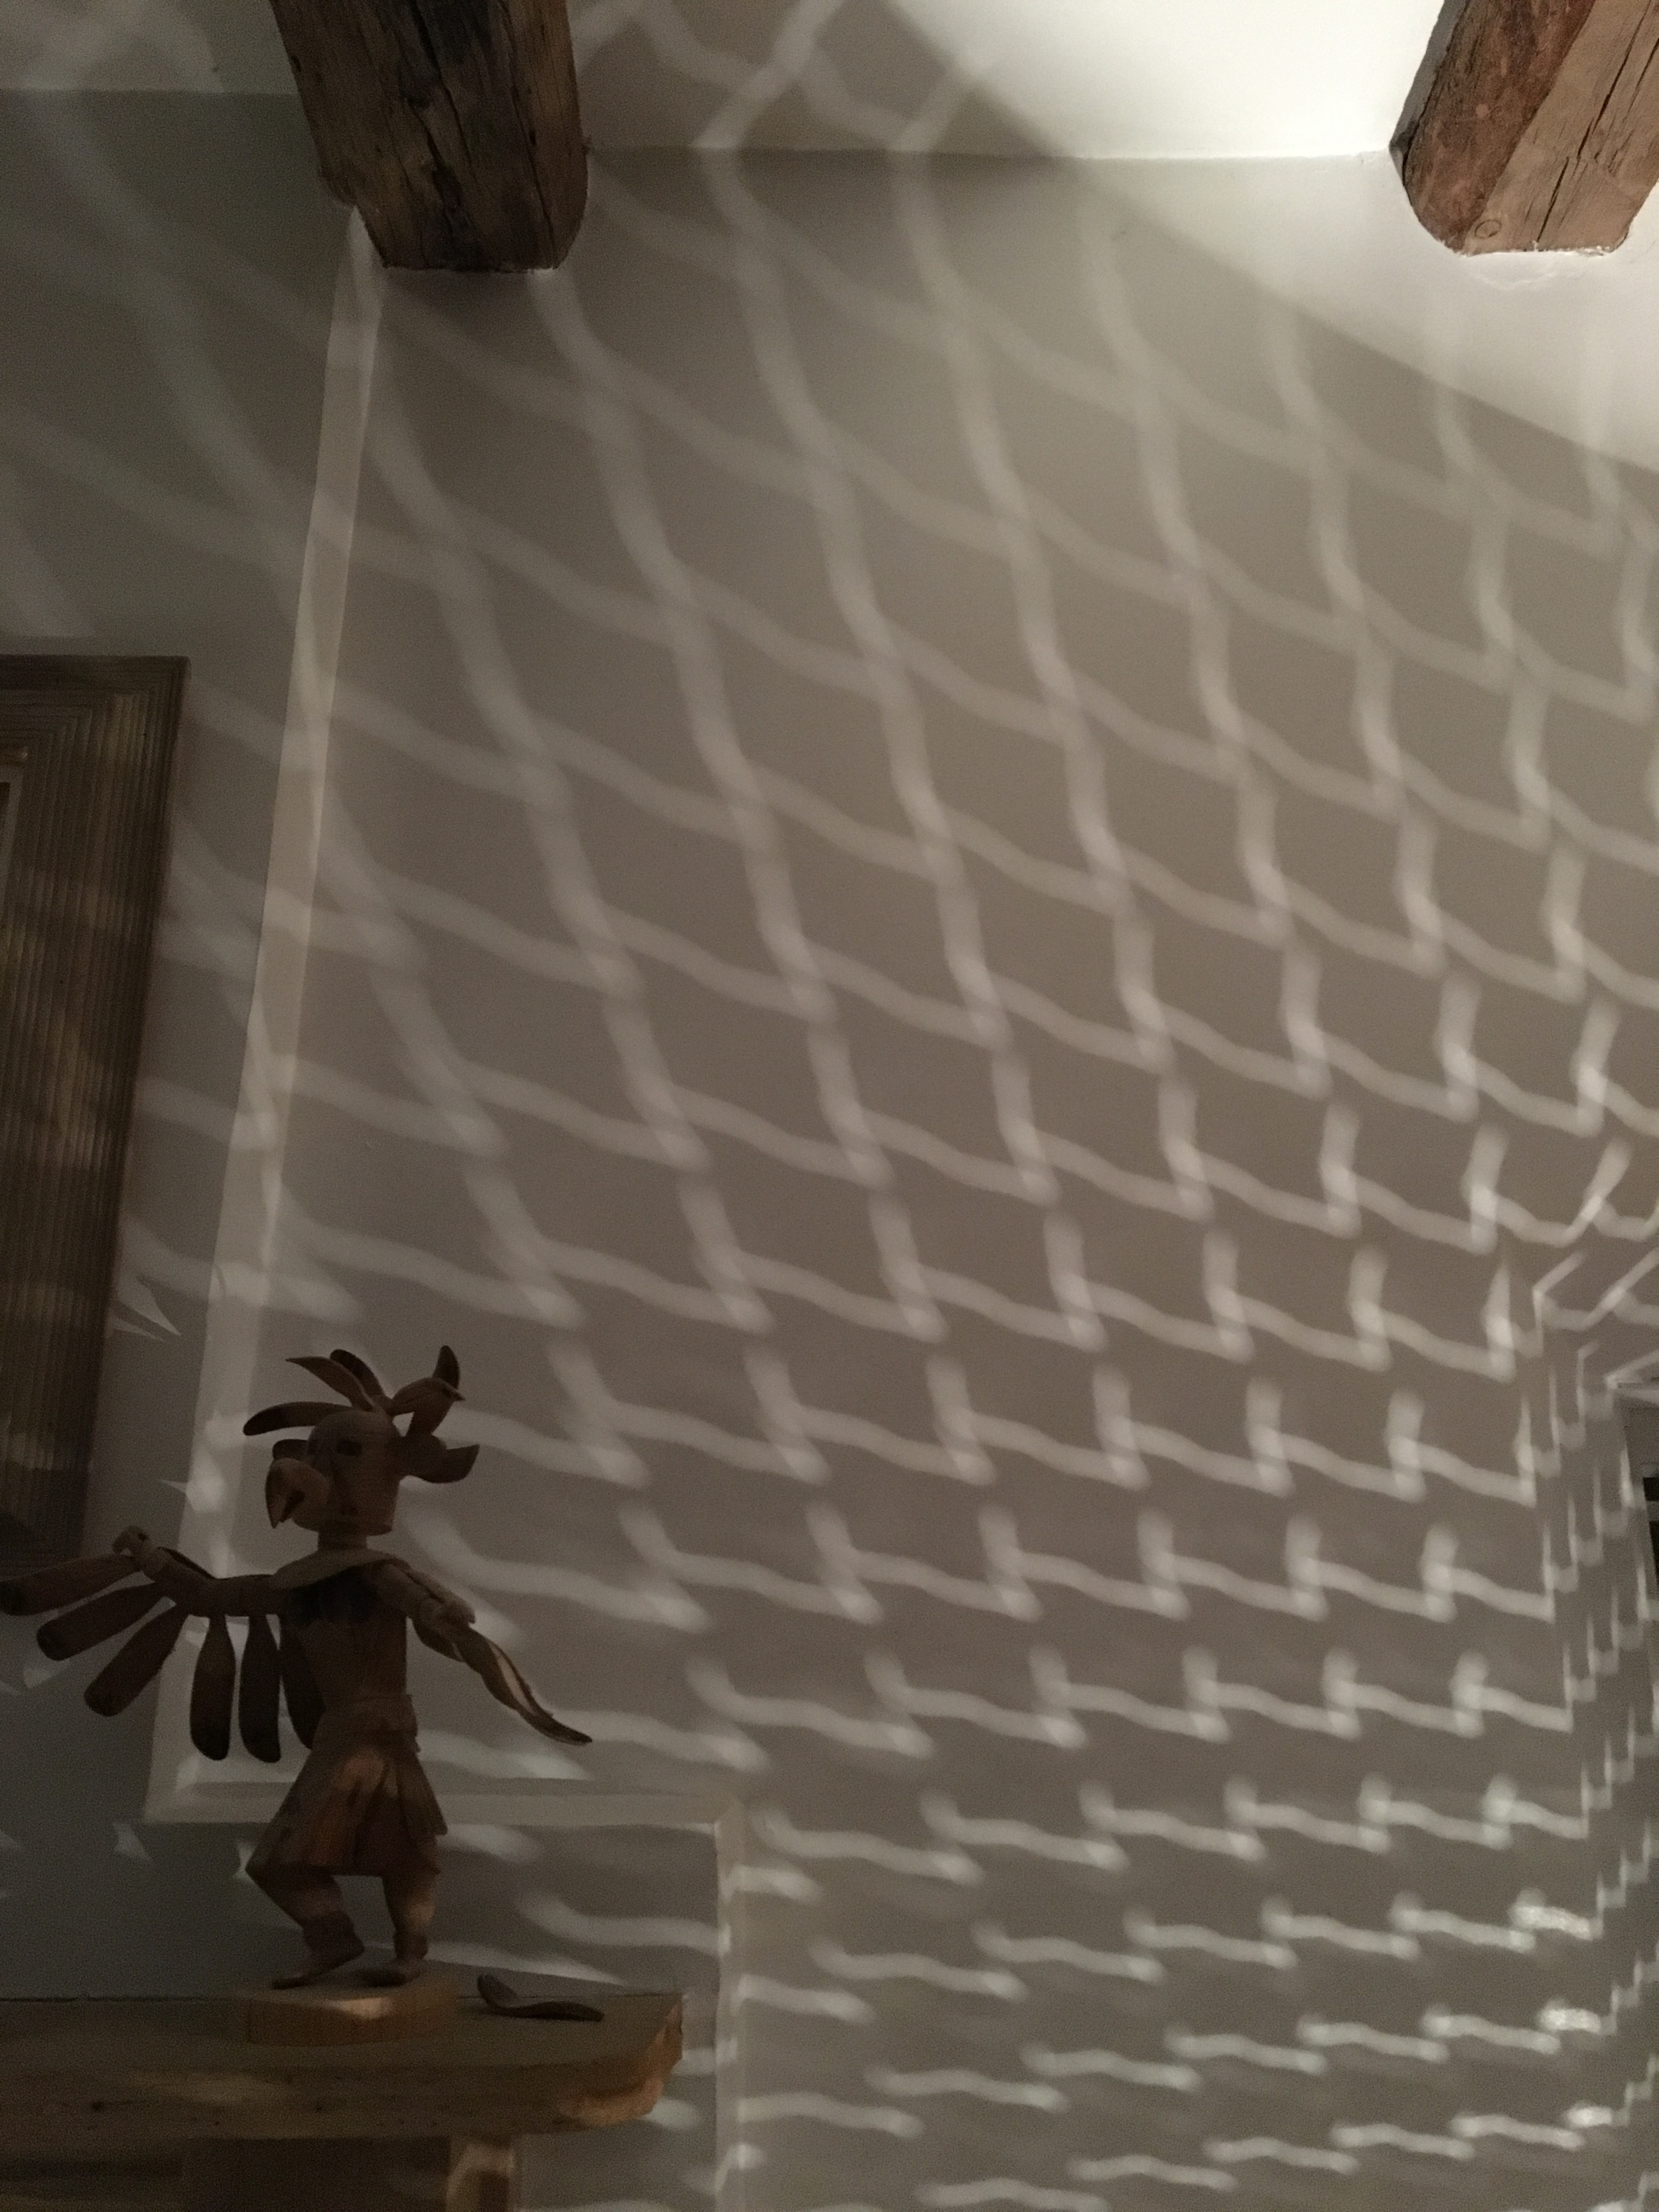 Katchina shadow dancing at the house